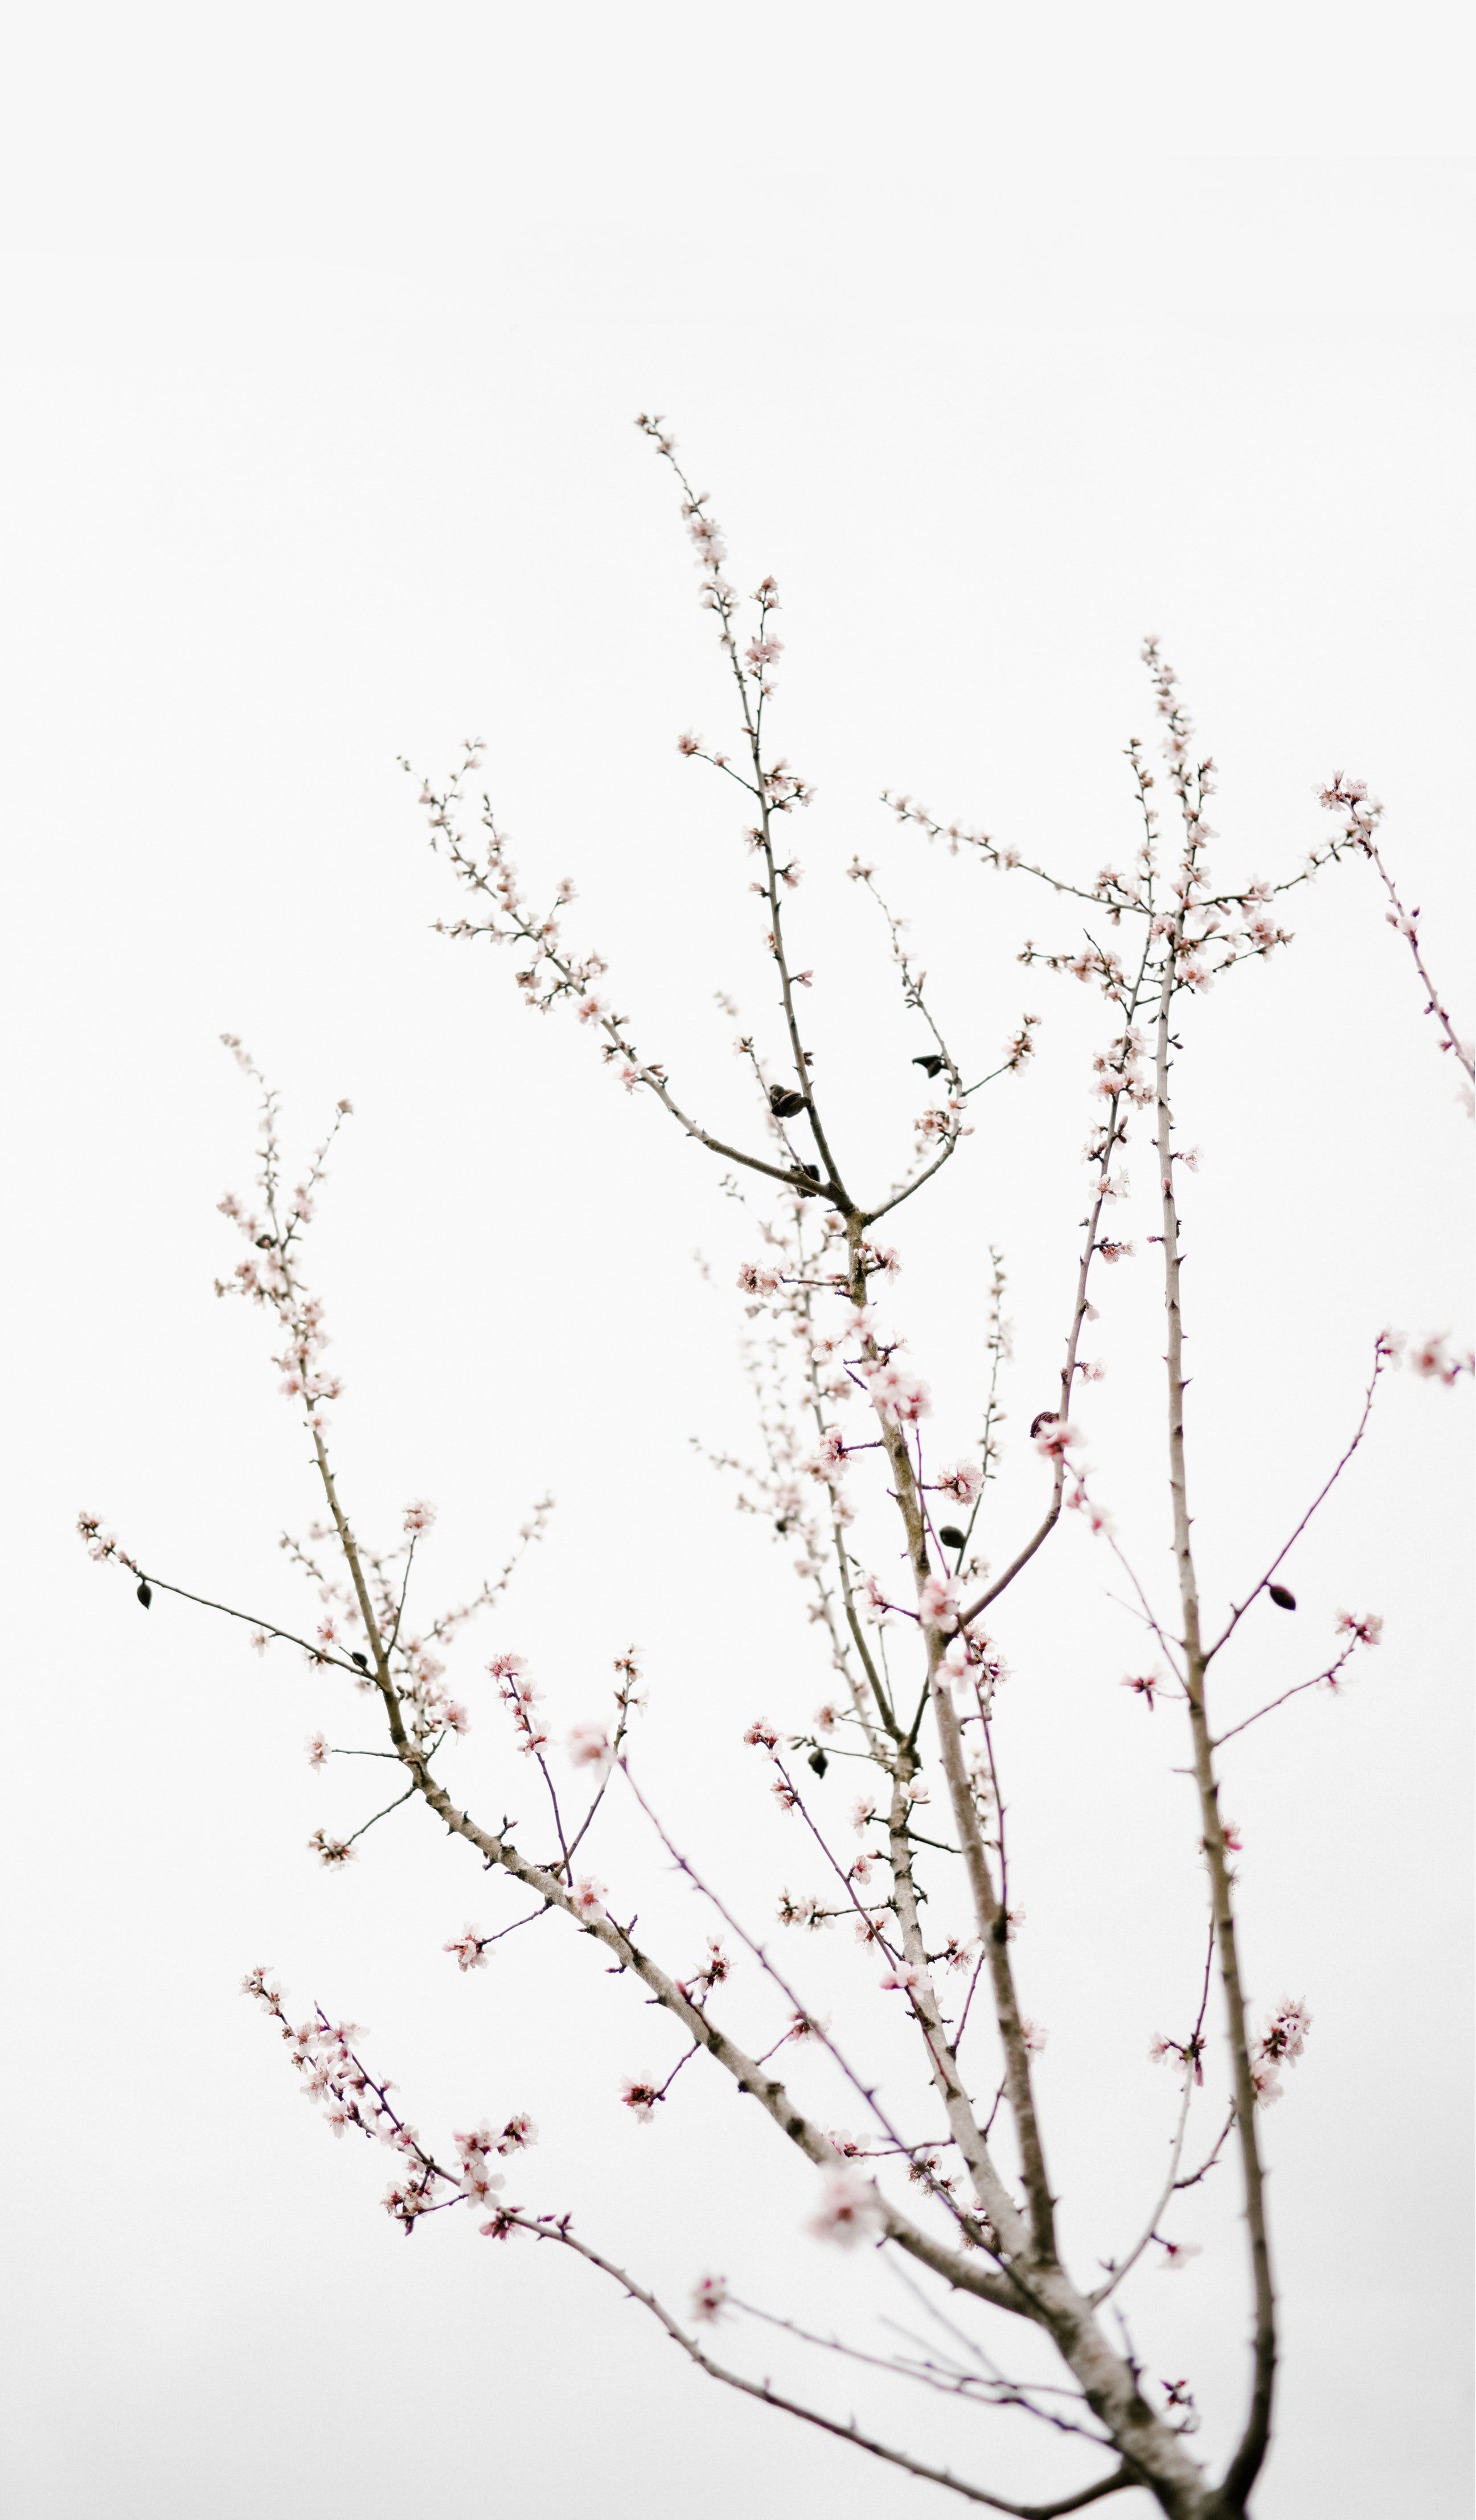 Neutral 100 Best Free Neutral White Minimal And Minimalism Photos On Unsplash Cherry Blossom Wallpaper Minimal Wallpaper Preppy Wallpaper